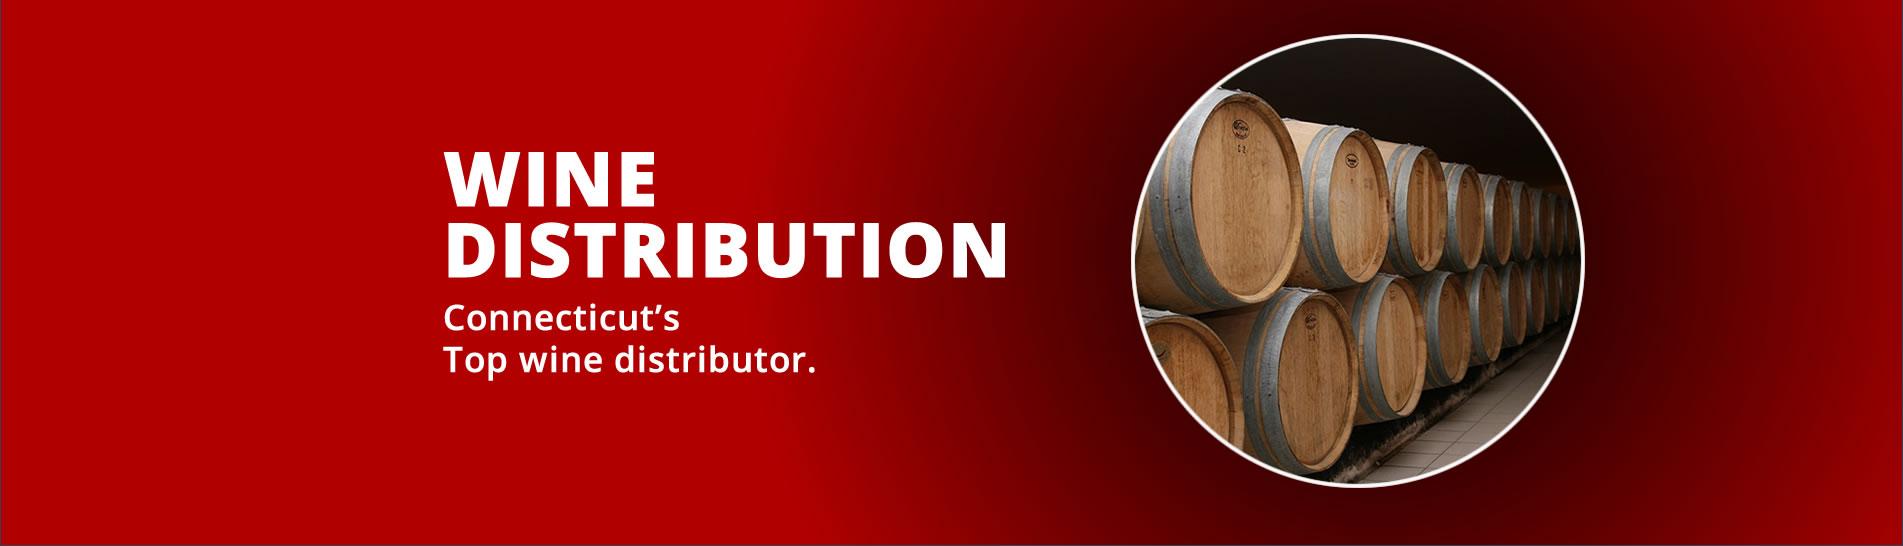 wine-distrib-bg